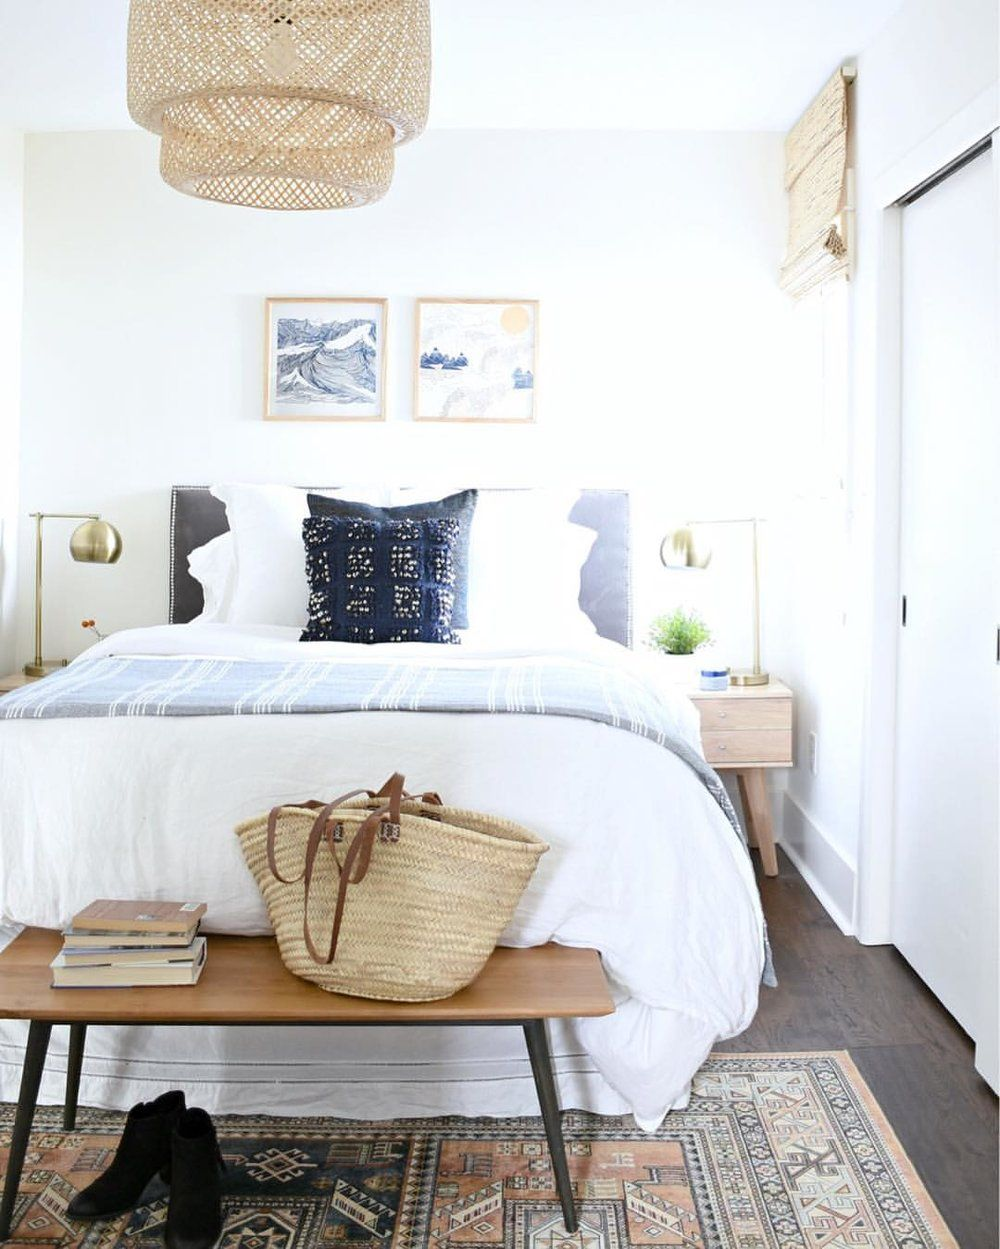 Get Home Design Ideas:  Get The Look: Coastal Cool Bedroom STUDIO MCGEE (Cool